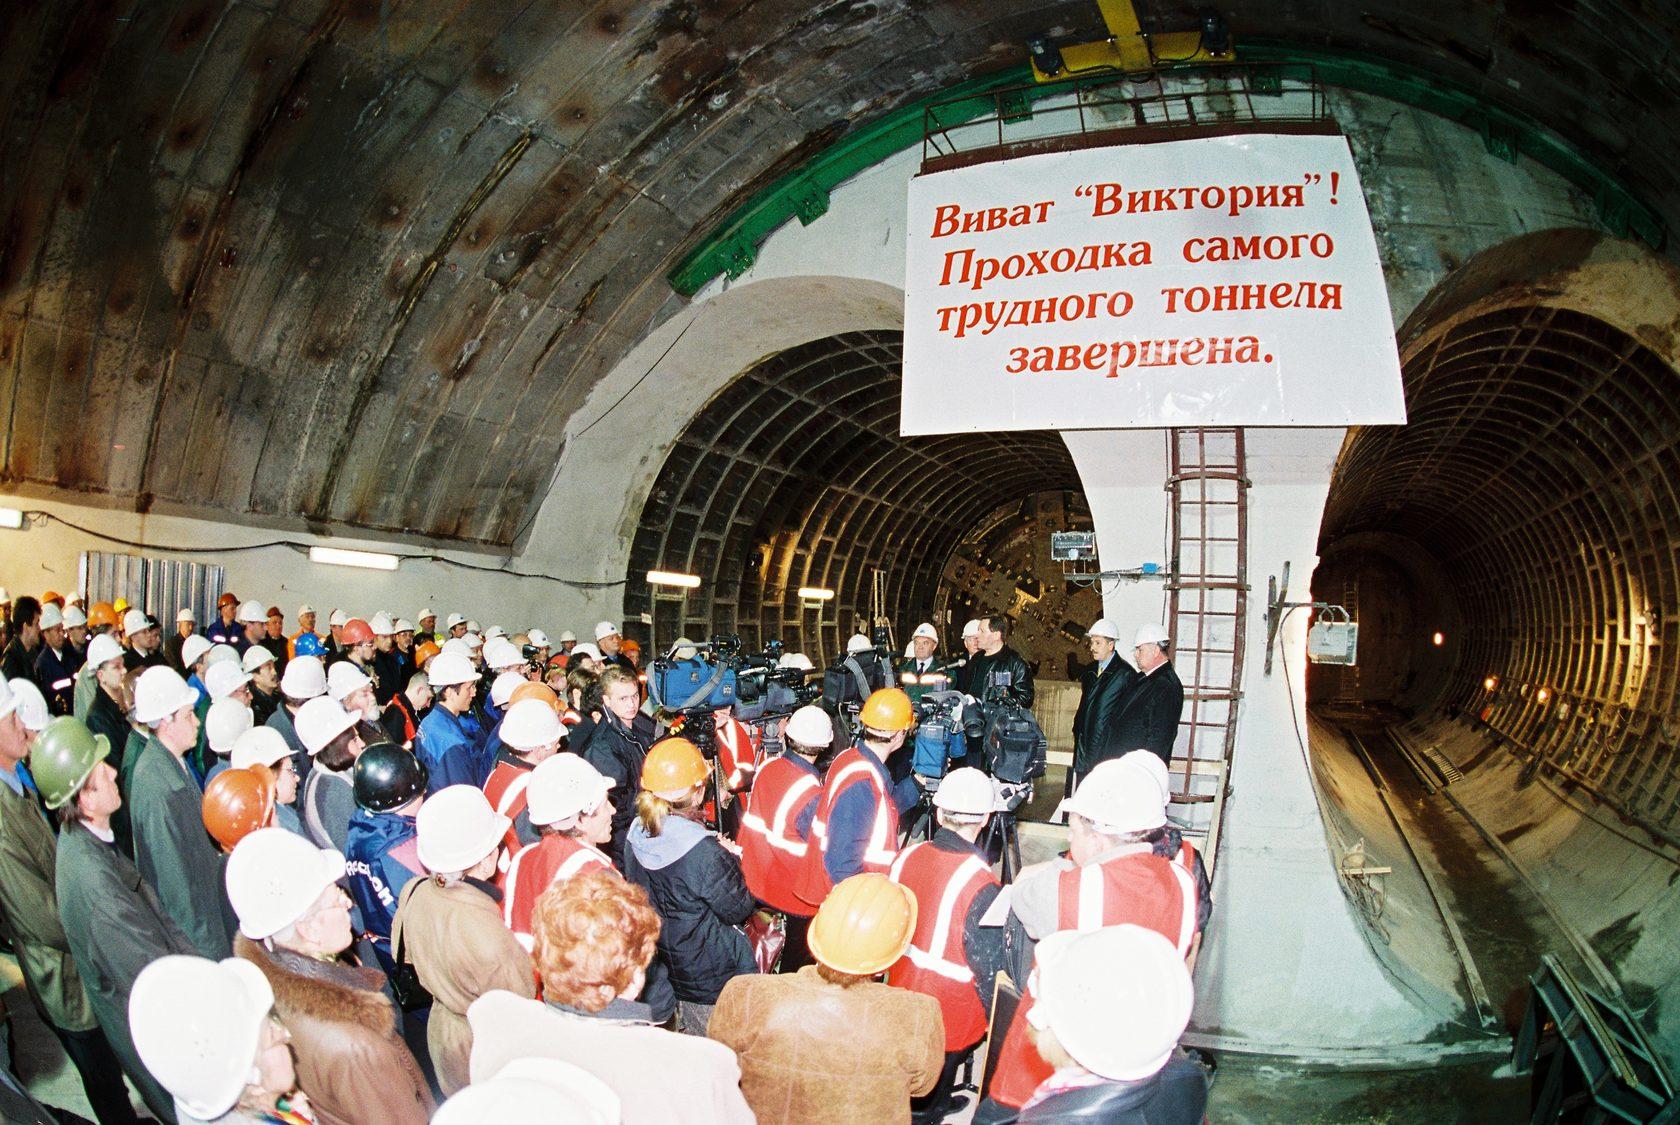 metro+lesnaya+metrostroi+fontanka